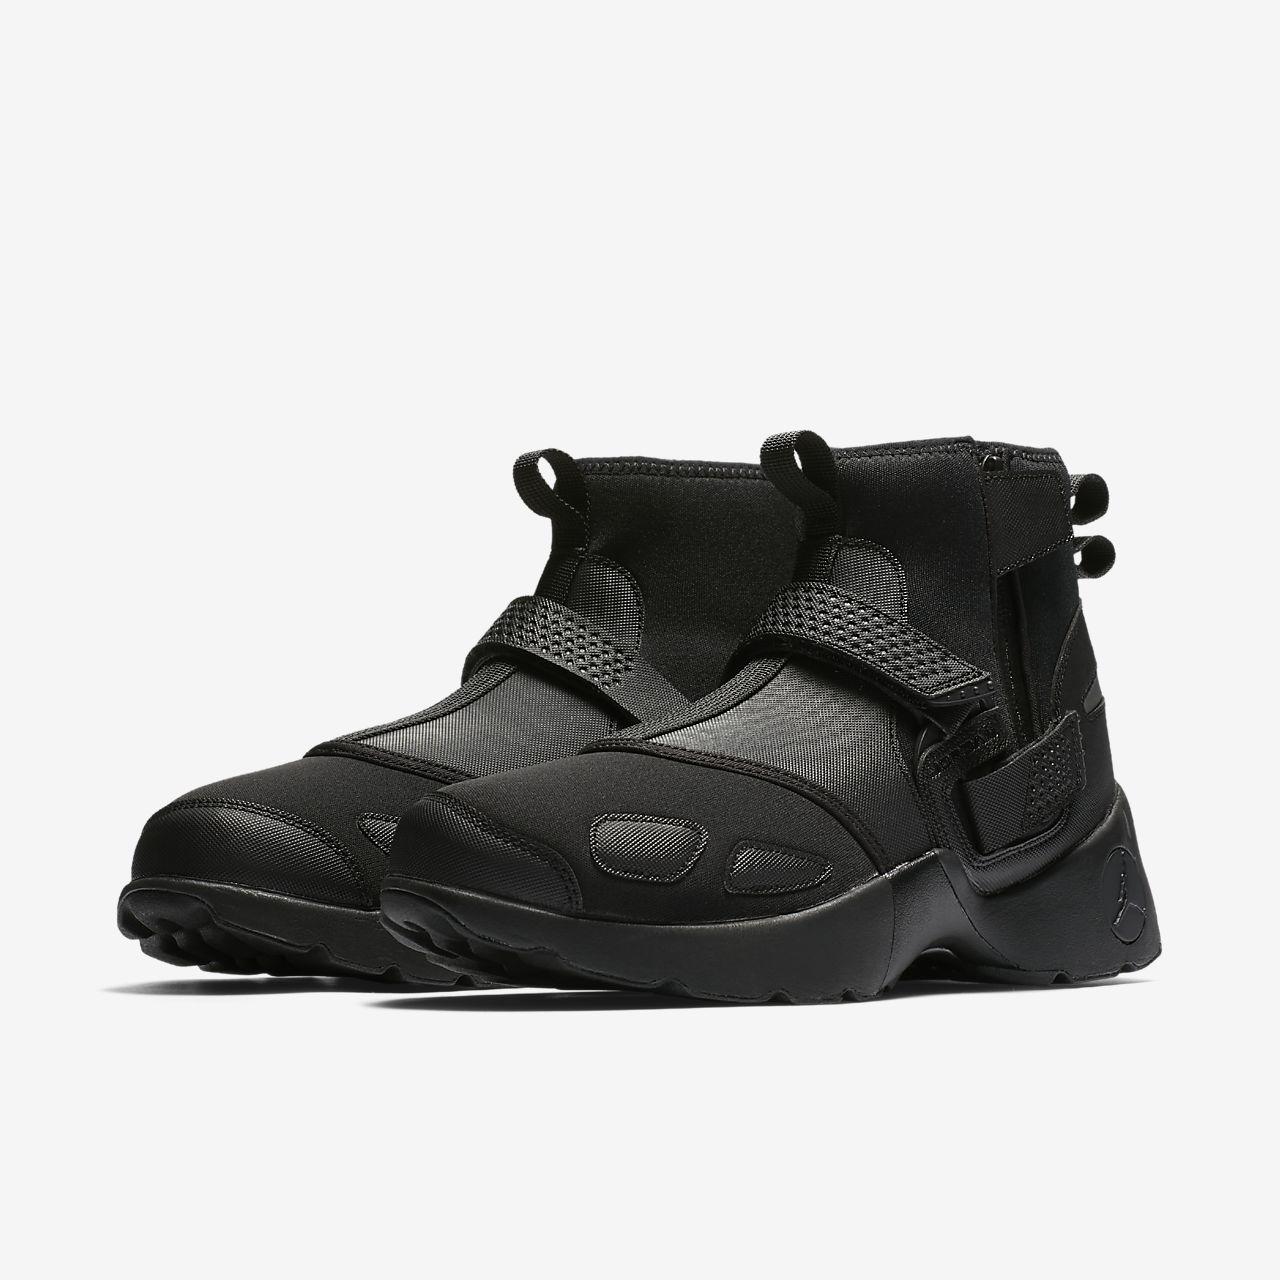 best service c5470 f8209 ... Low Resolution Jordan Trunner LX High Mens Shoe Jordan Trunner LX High  Mens Shoe ...